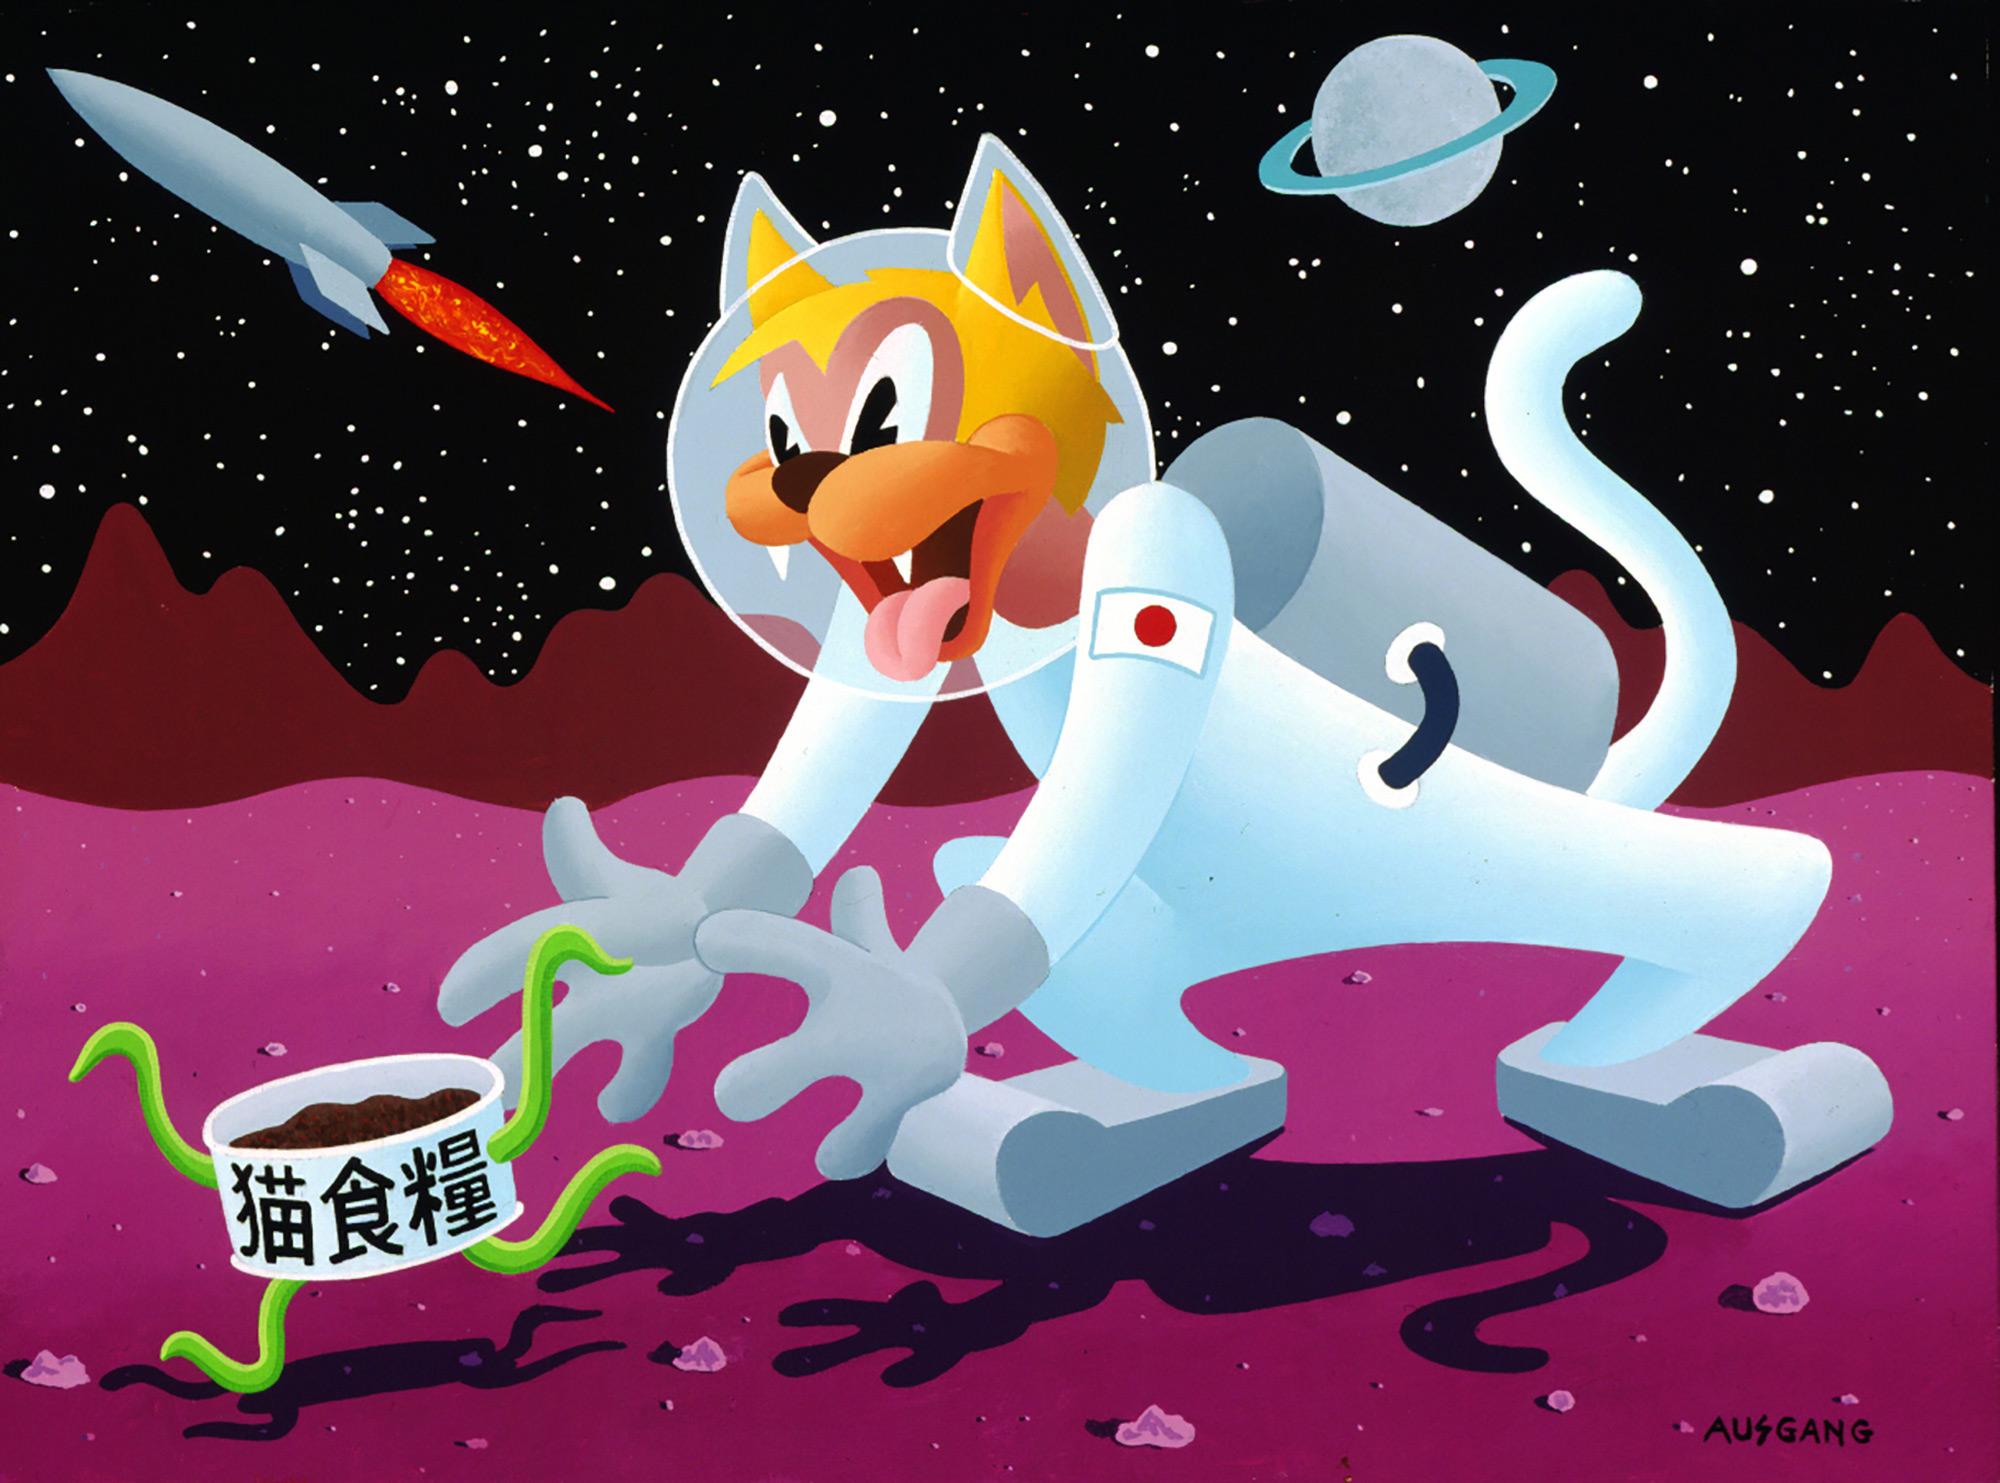 Planet Cat Food, 2003